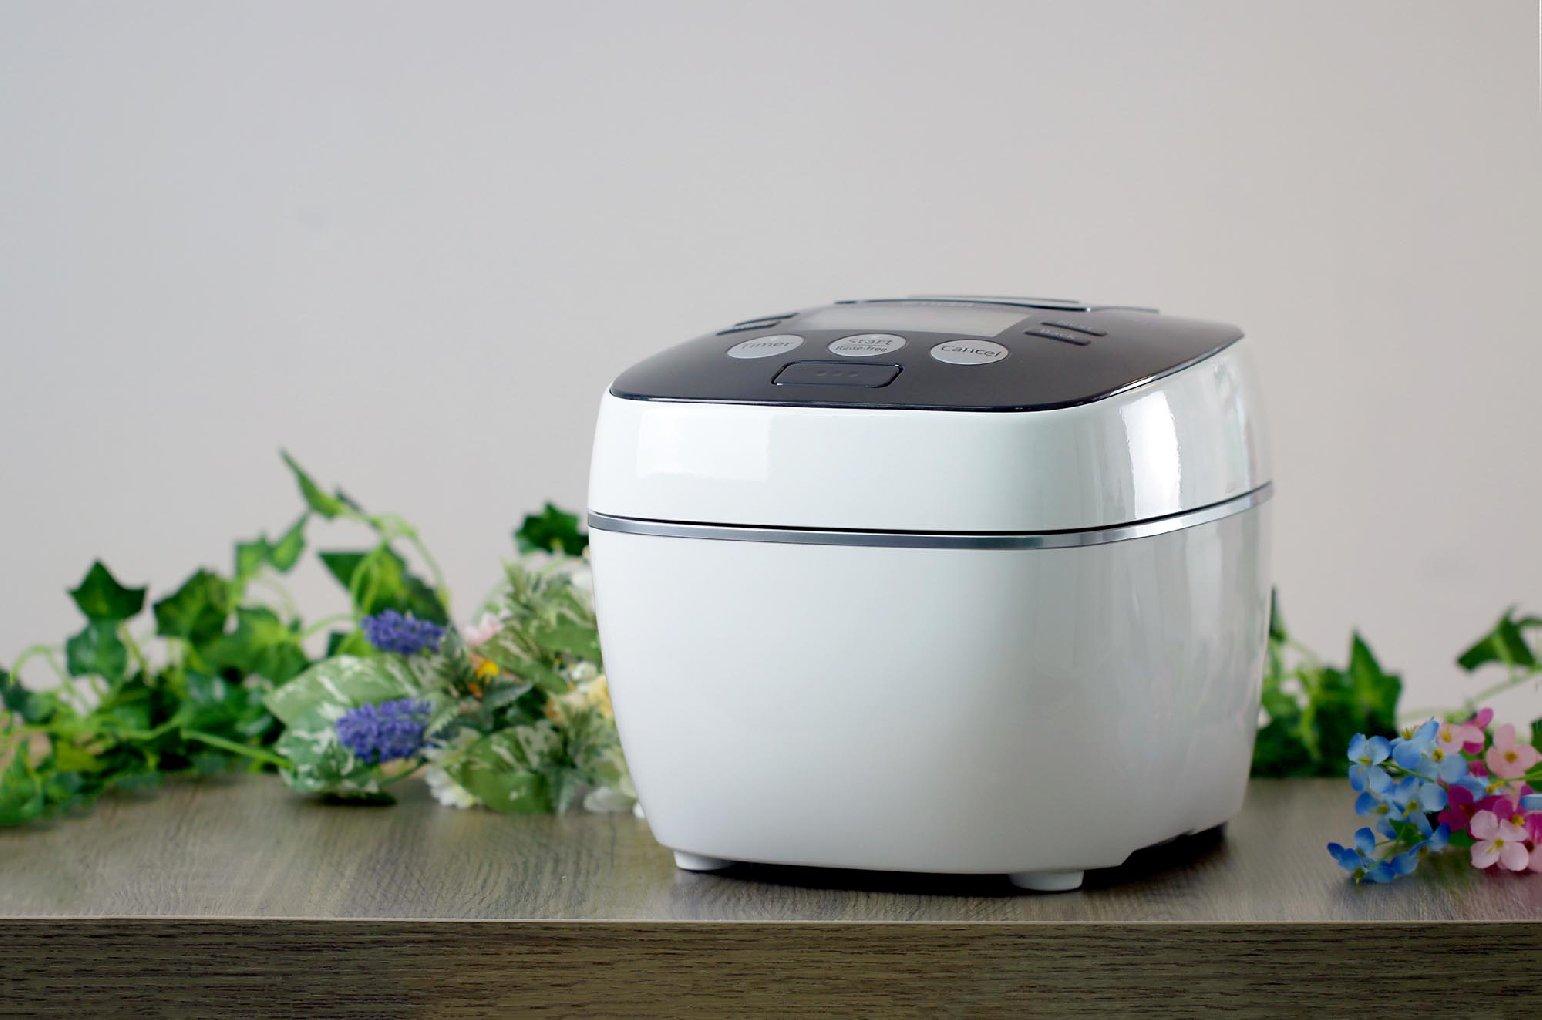 IH + 土鍋塗層  TIGER 土鍋塗層 IH 電飯煲